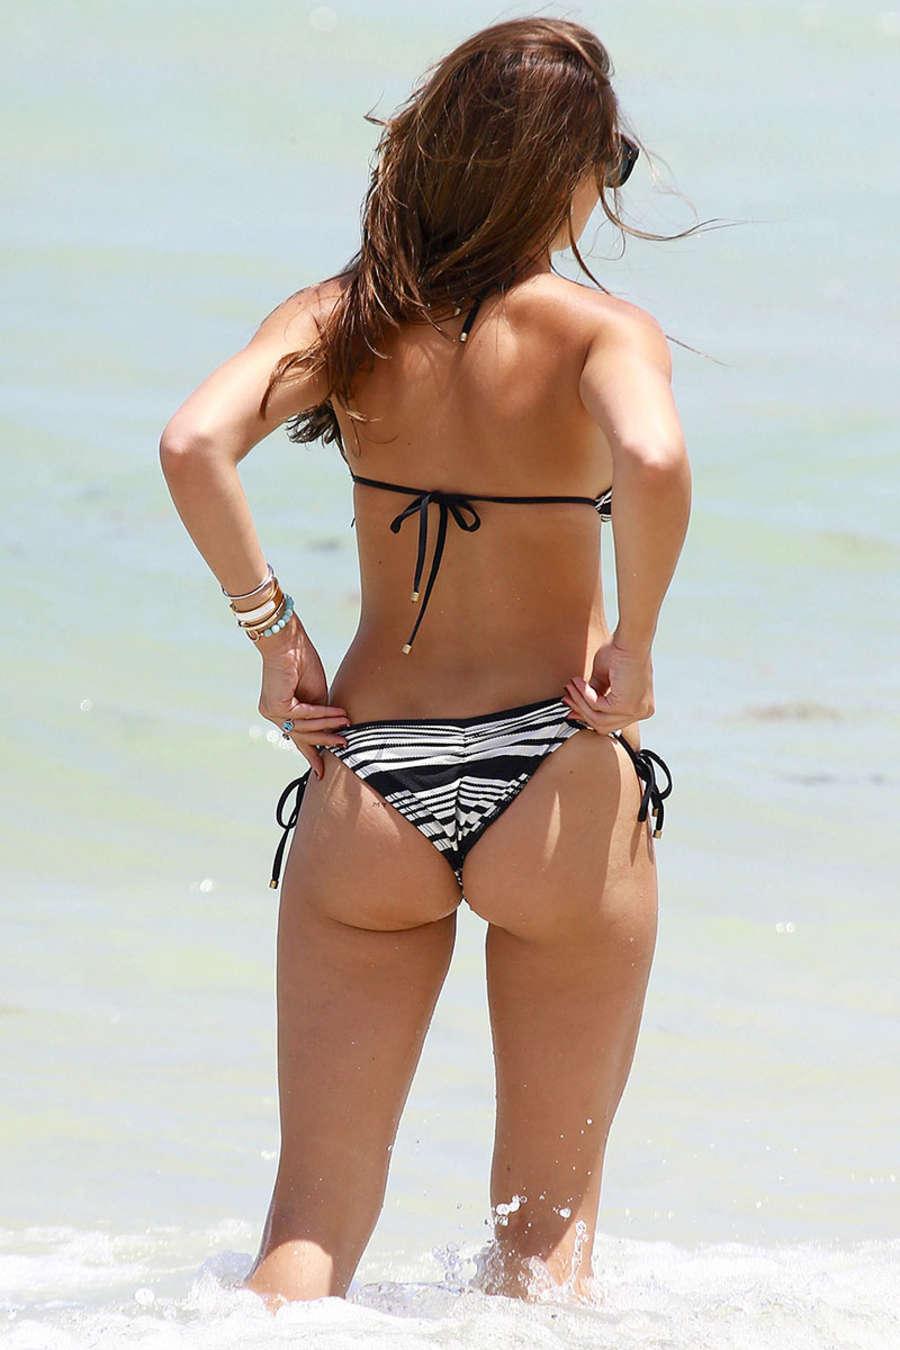 Keleigh Sperry In Bikini 02 Gotceleb